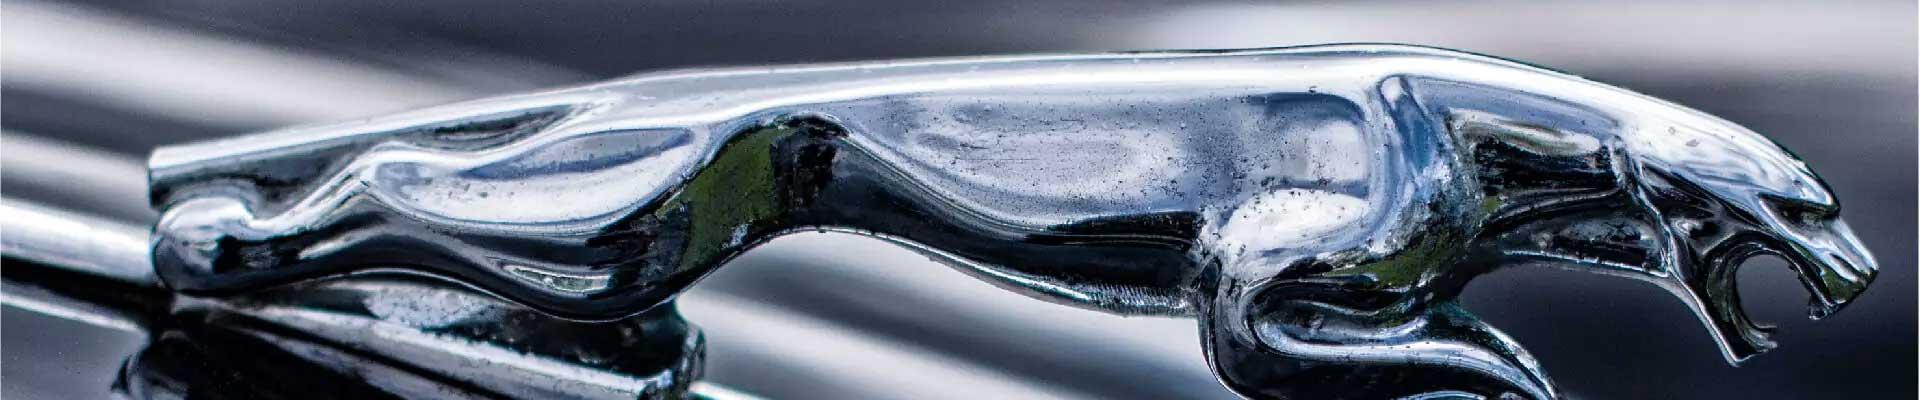 performance-car-insurance-jaguar